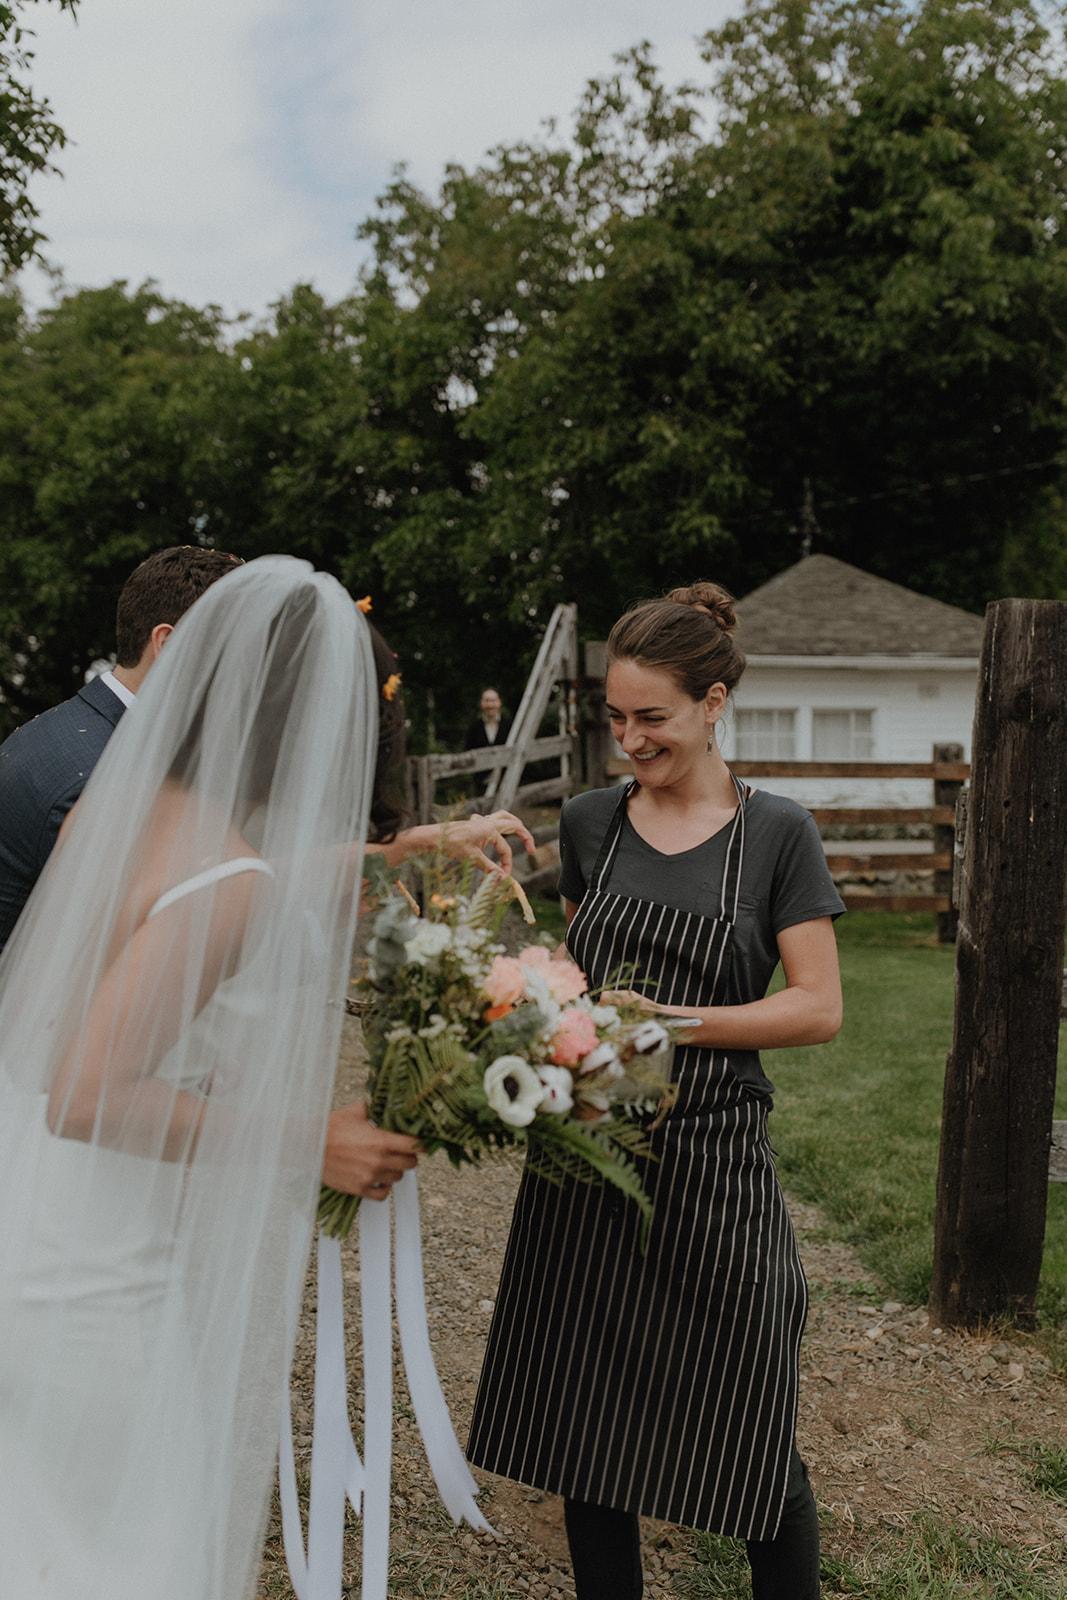 cortney_skye_wedding_june2019-453.jpg